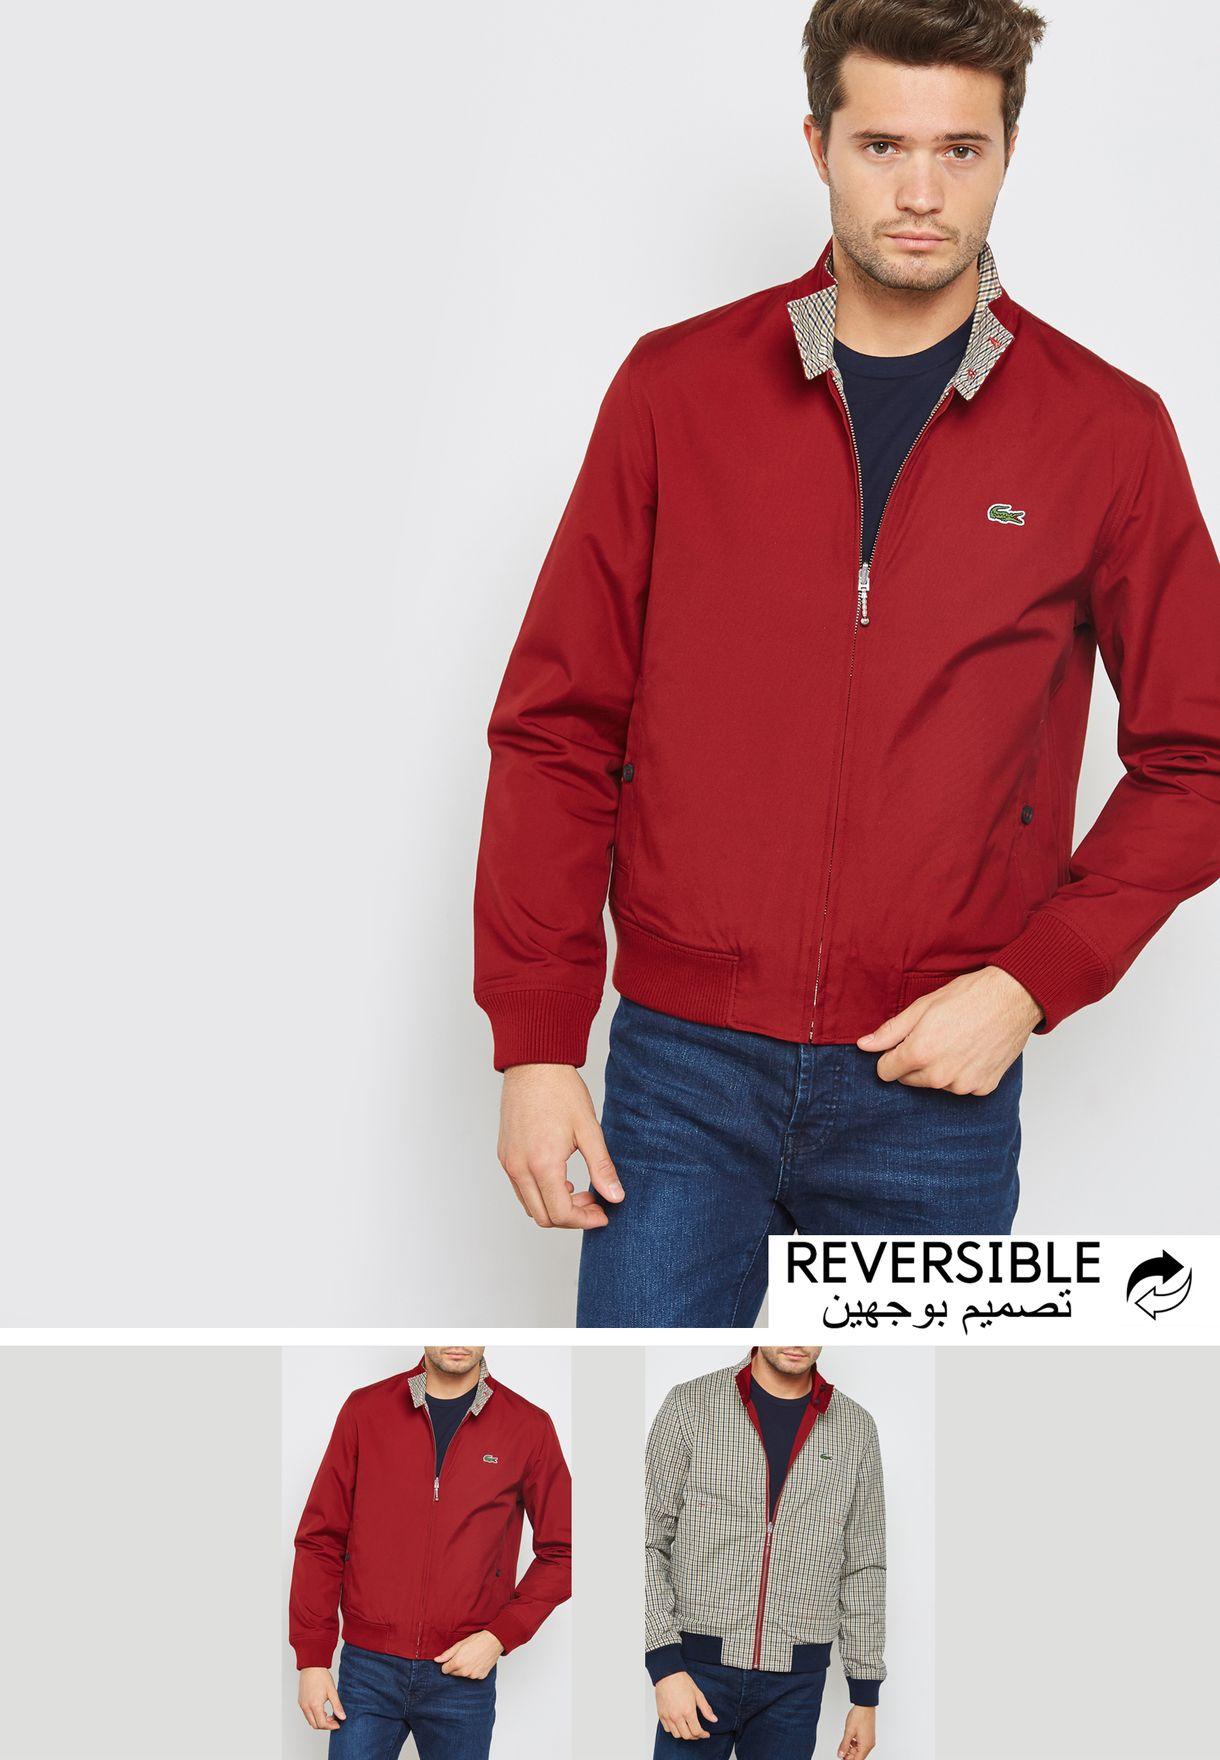 c1ec89003 Shop Lacoste Live Brand multicolor Reversible Checked jacket BH9128-00 C7R  for Men in UAE - LA360AT81NLU